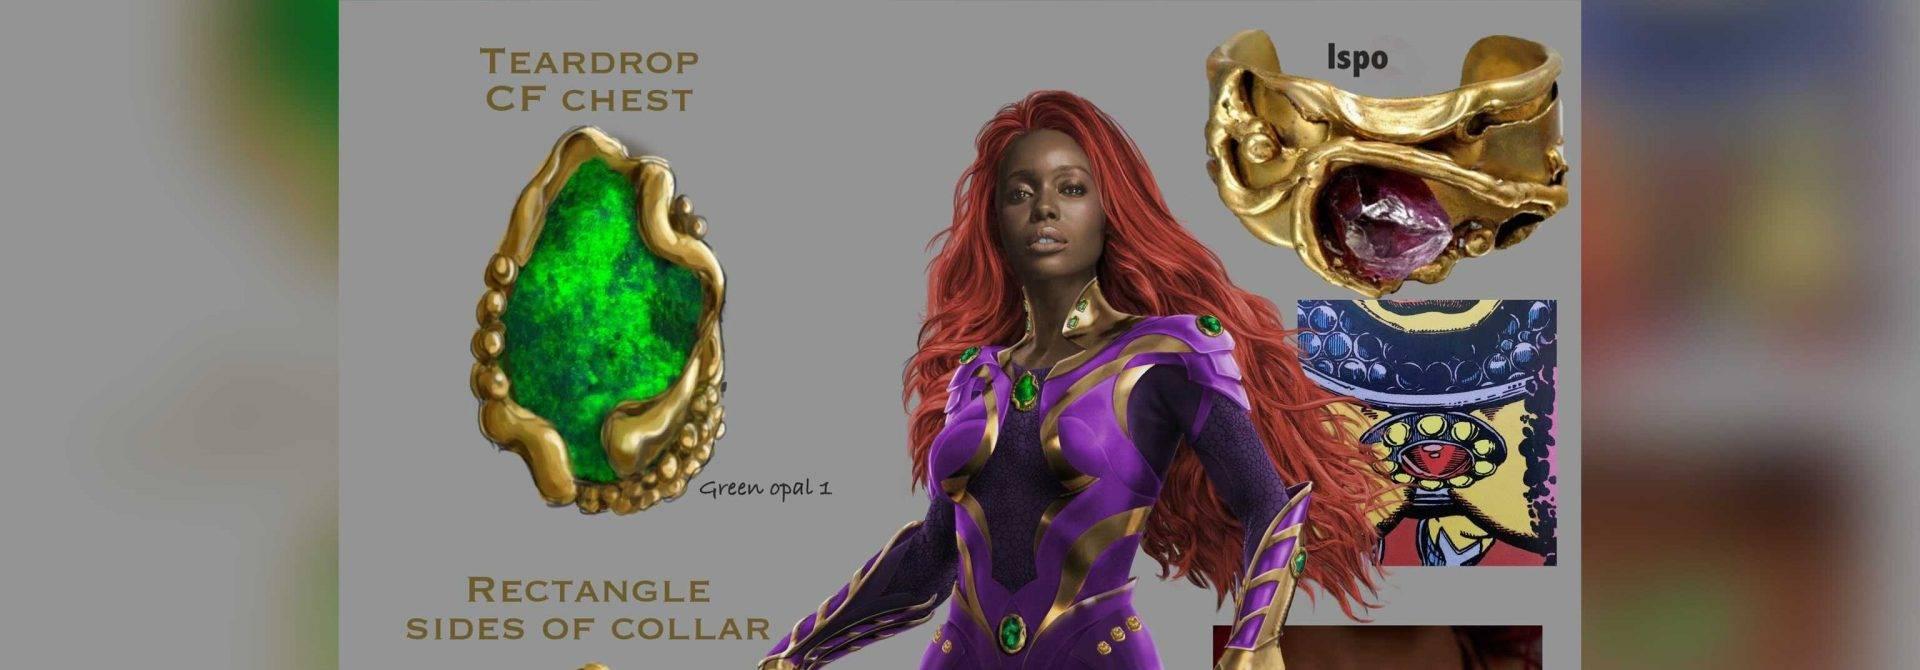 Season 3 of Titans gave Starfire a makeover